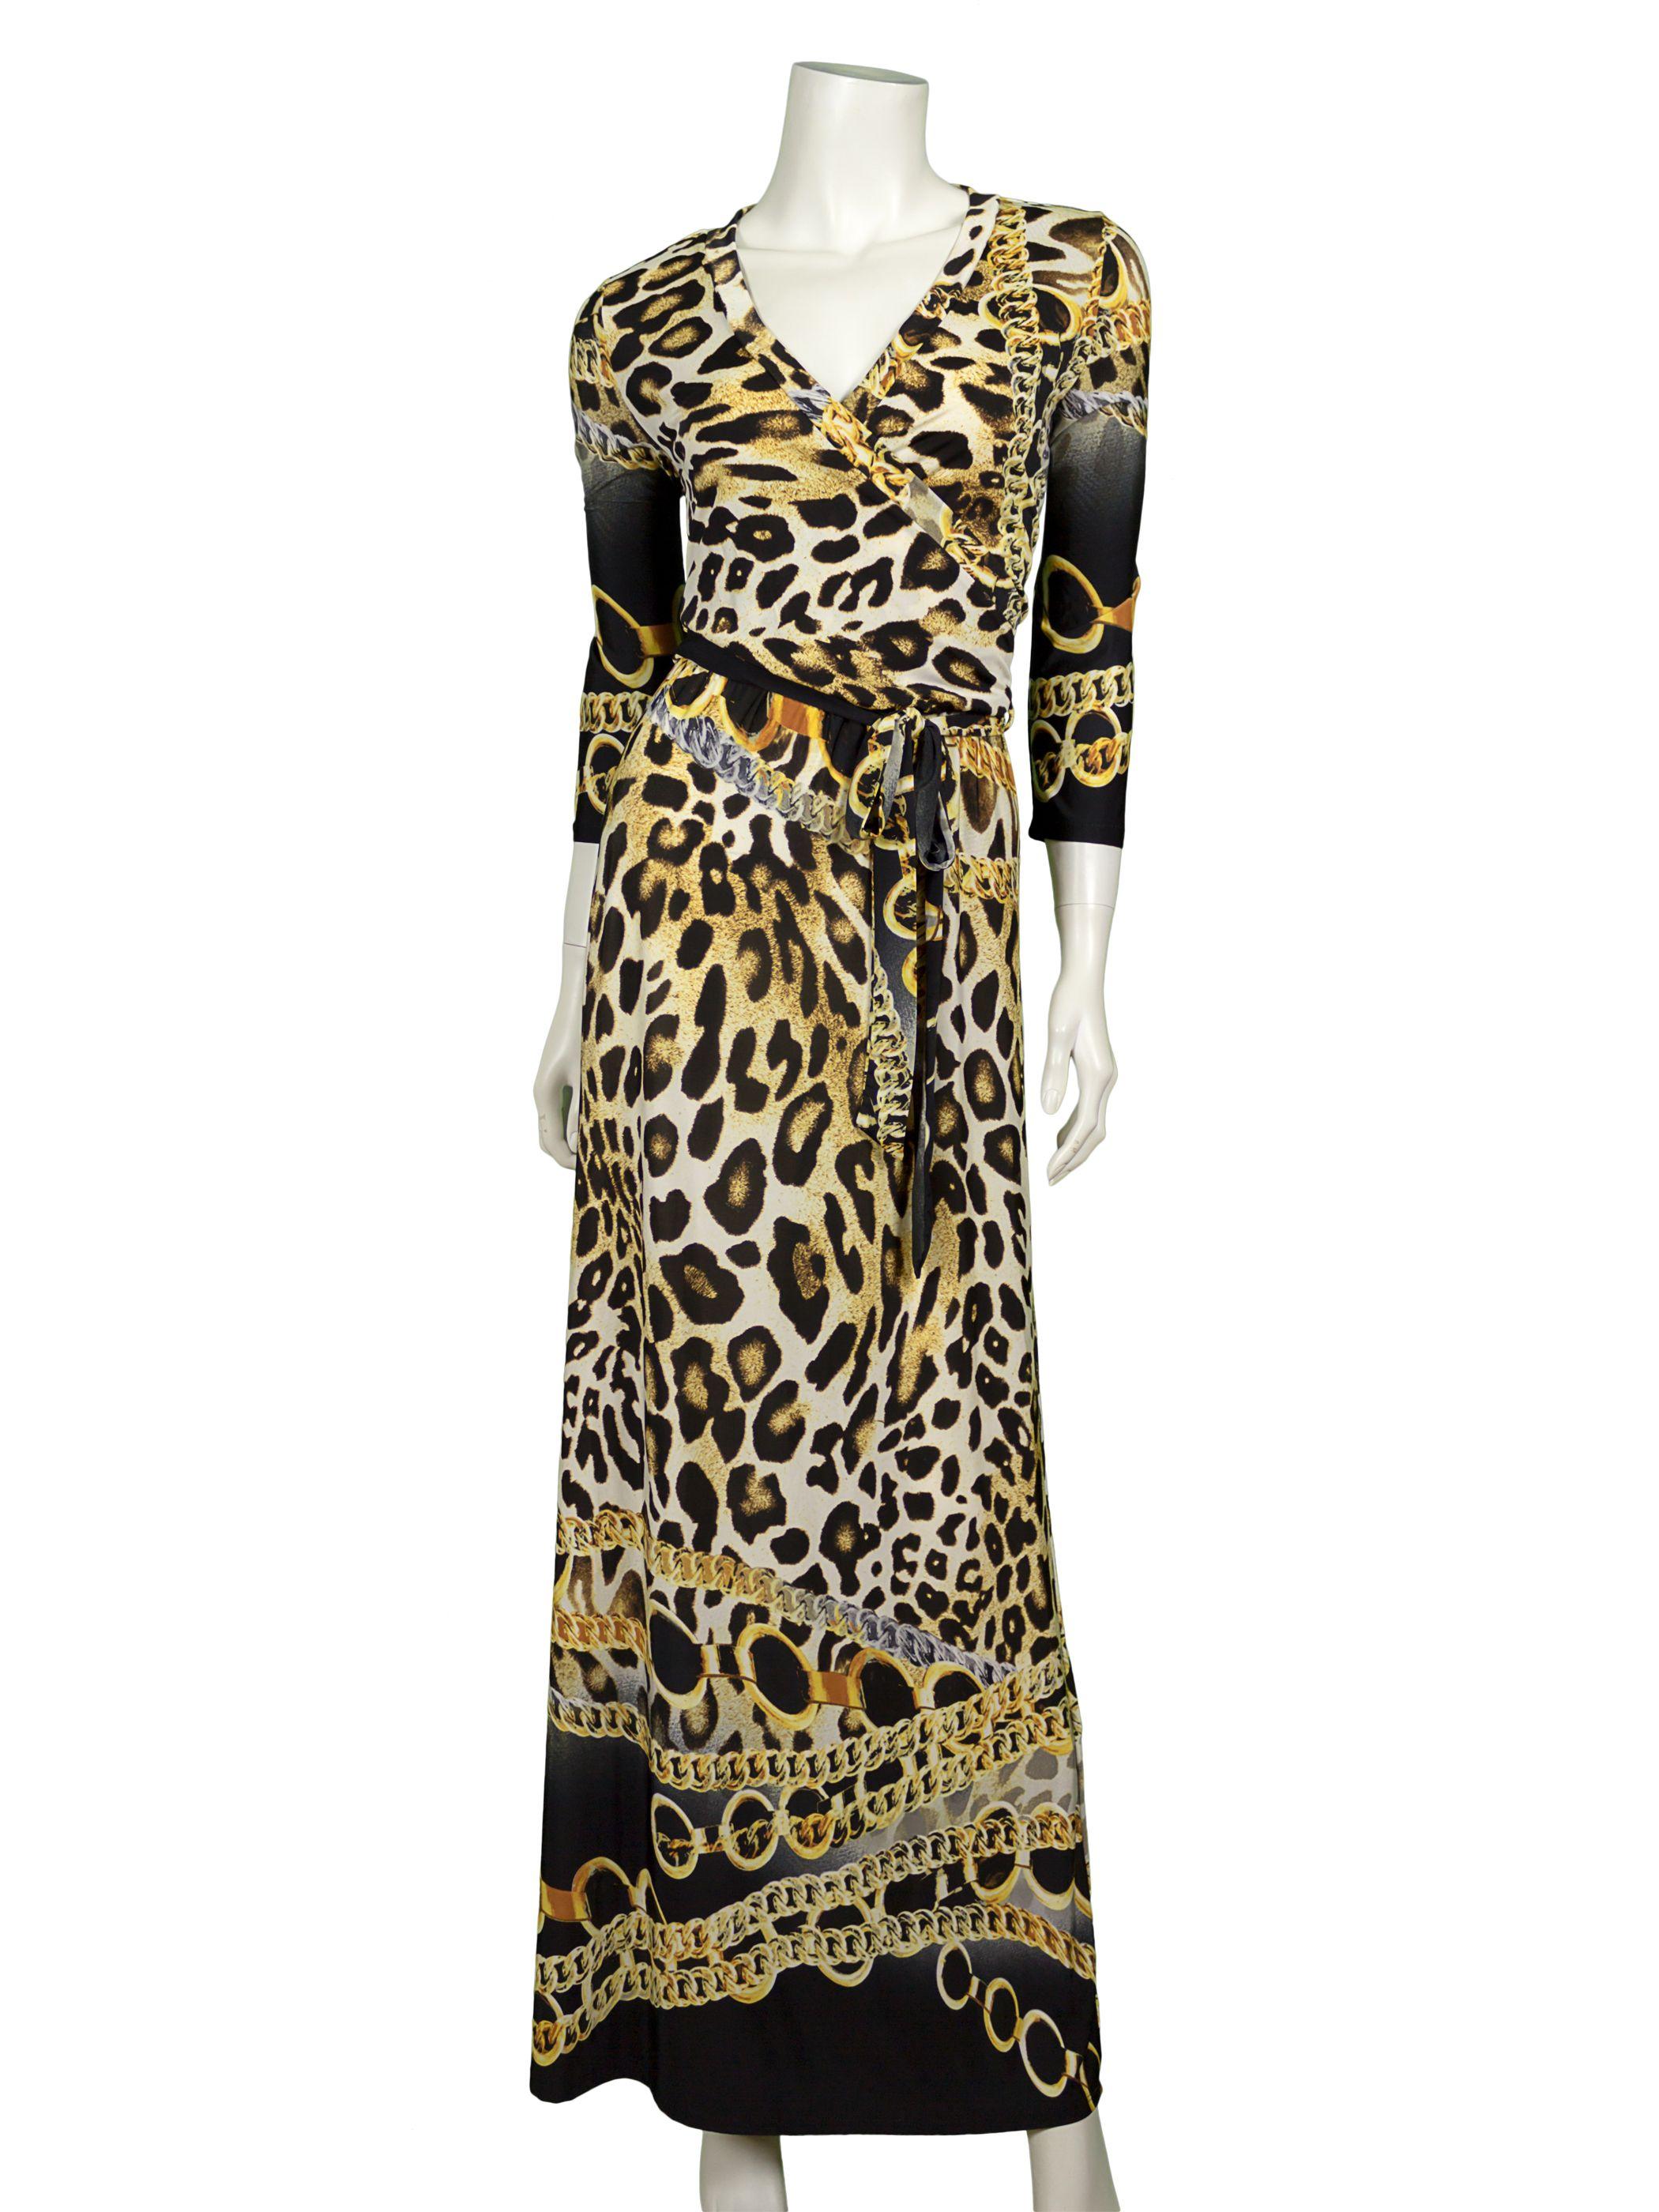 Jersey Kleid, multicolor - Online Shop meinkleidchen.de ...